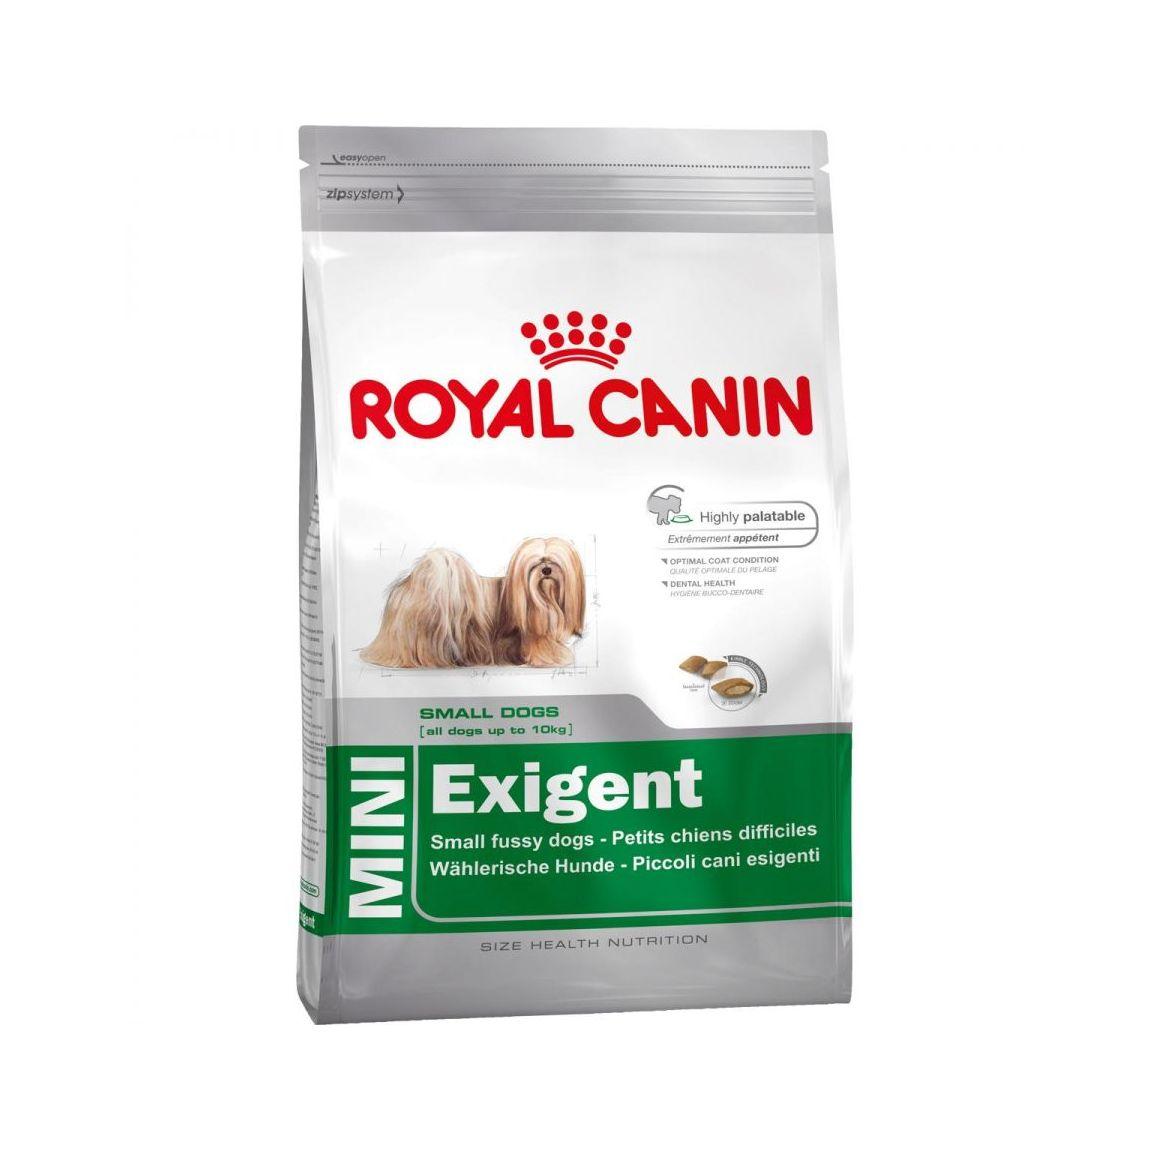 Royal Canin Mini Exigent 2 kg